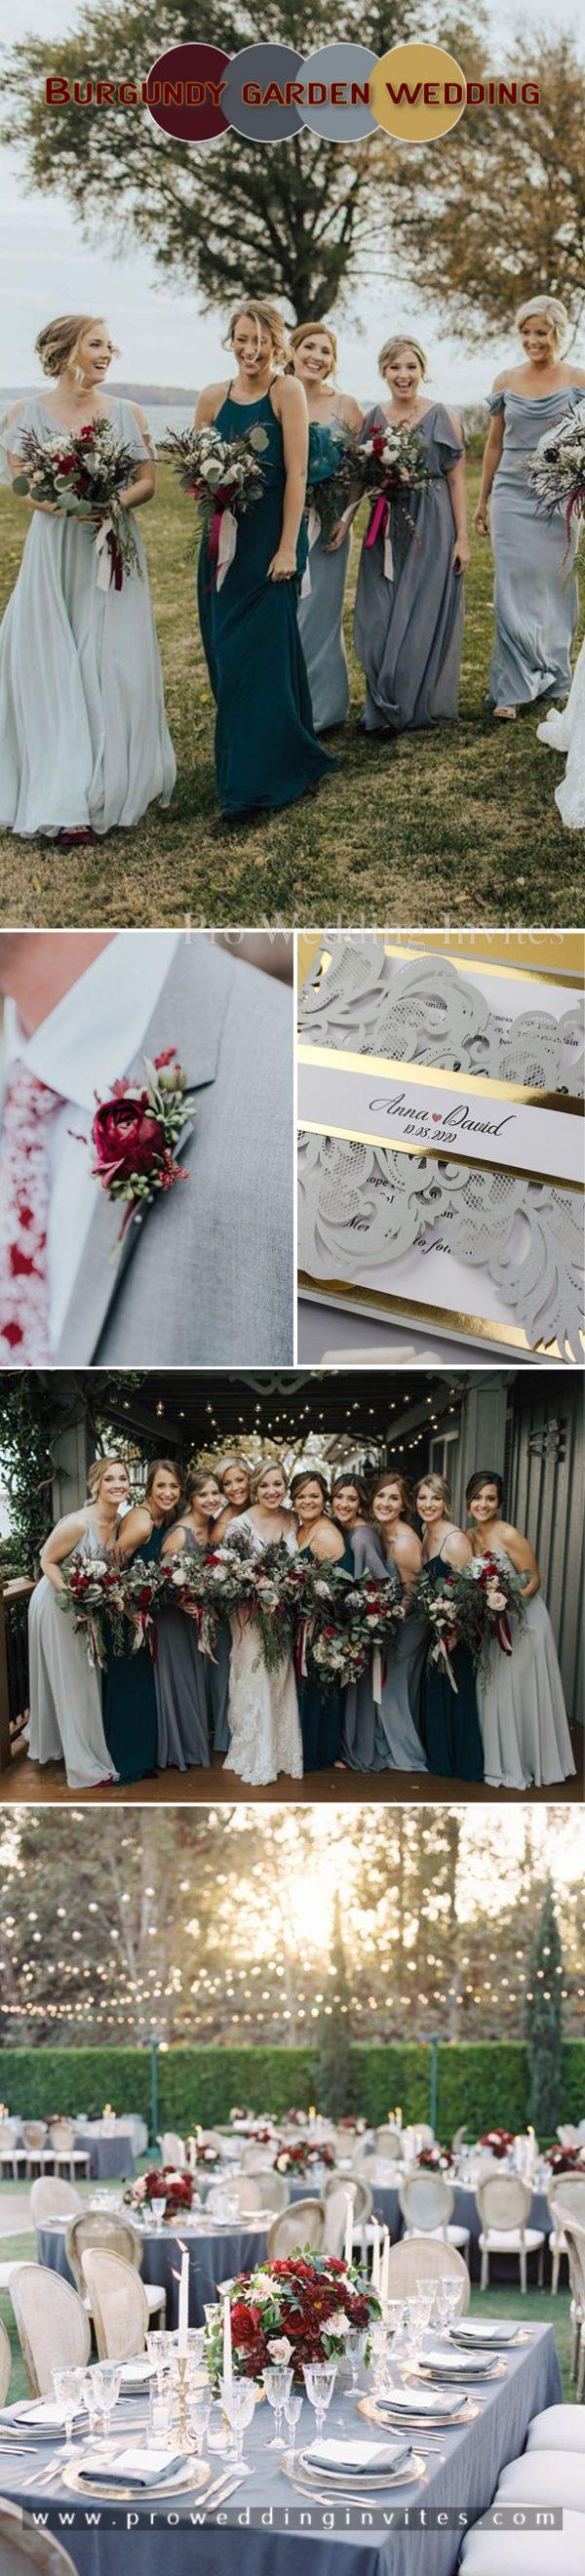 Burgundy, grey and gold garden wedding